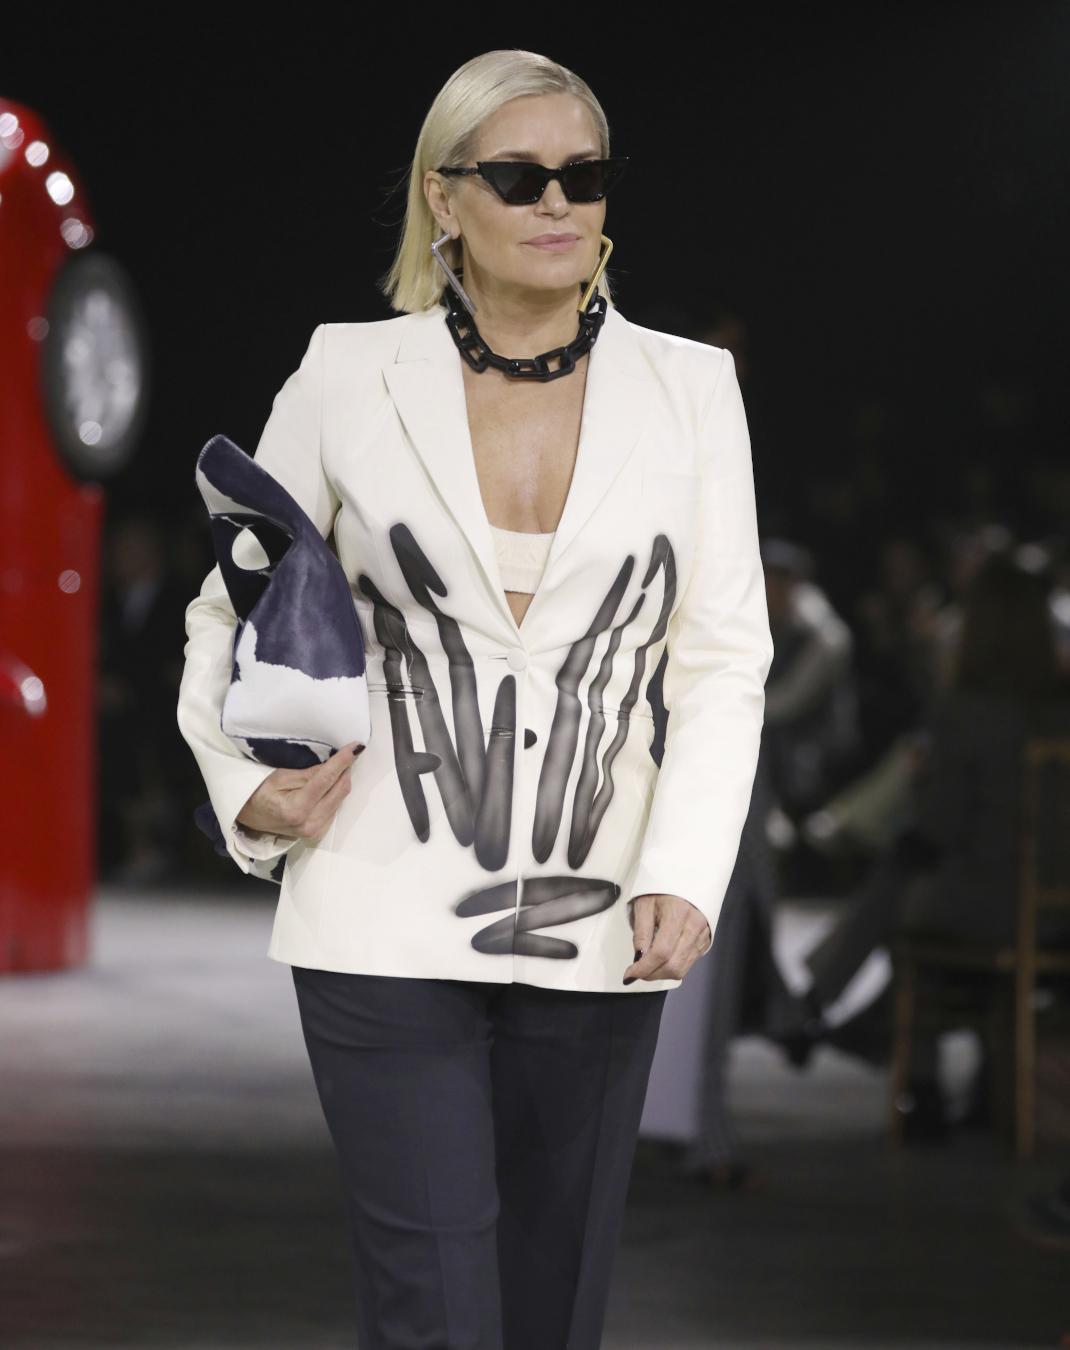 Yolanda Hadid στο show του Off White στην Εβδομάδα Μόδας του Παρισιού